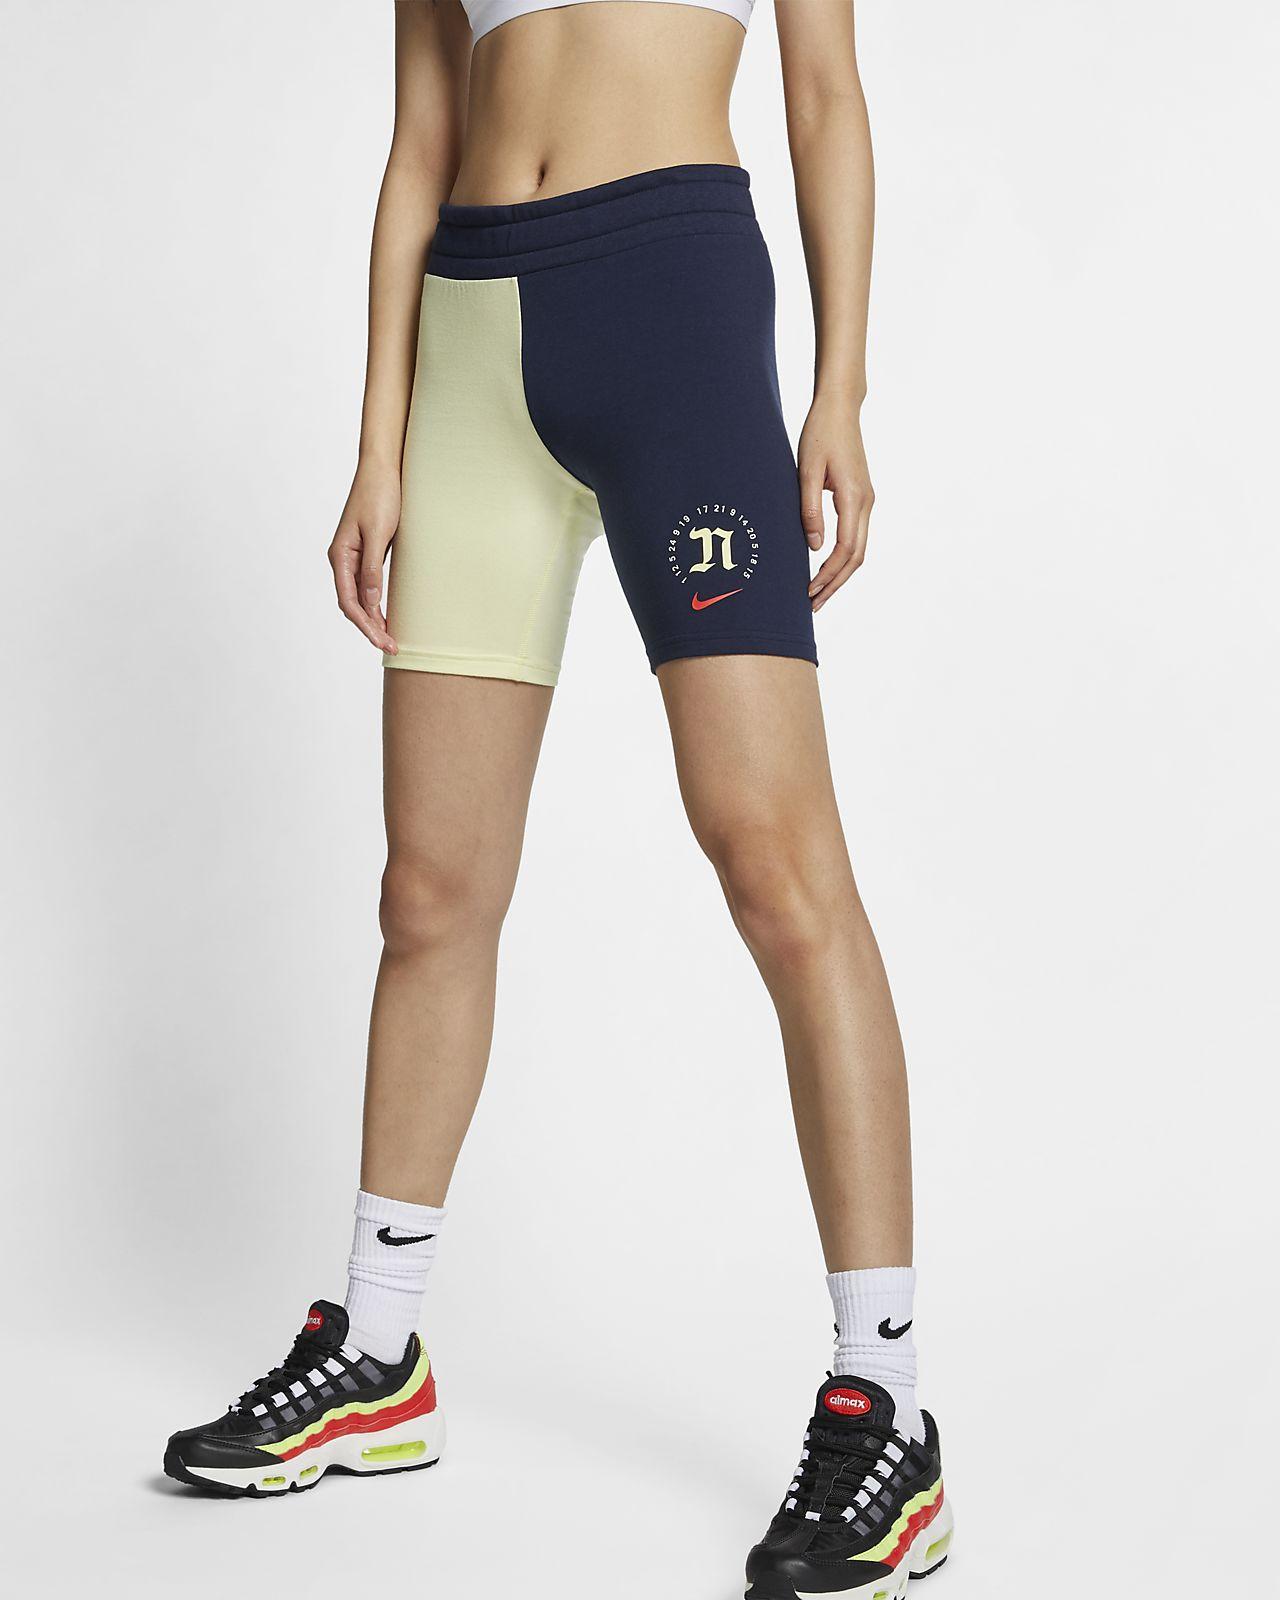 the latest 6db30 b7118 ... Nike Sportswear Women s Bike Shorts by Alexis Quintero